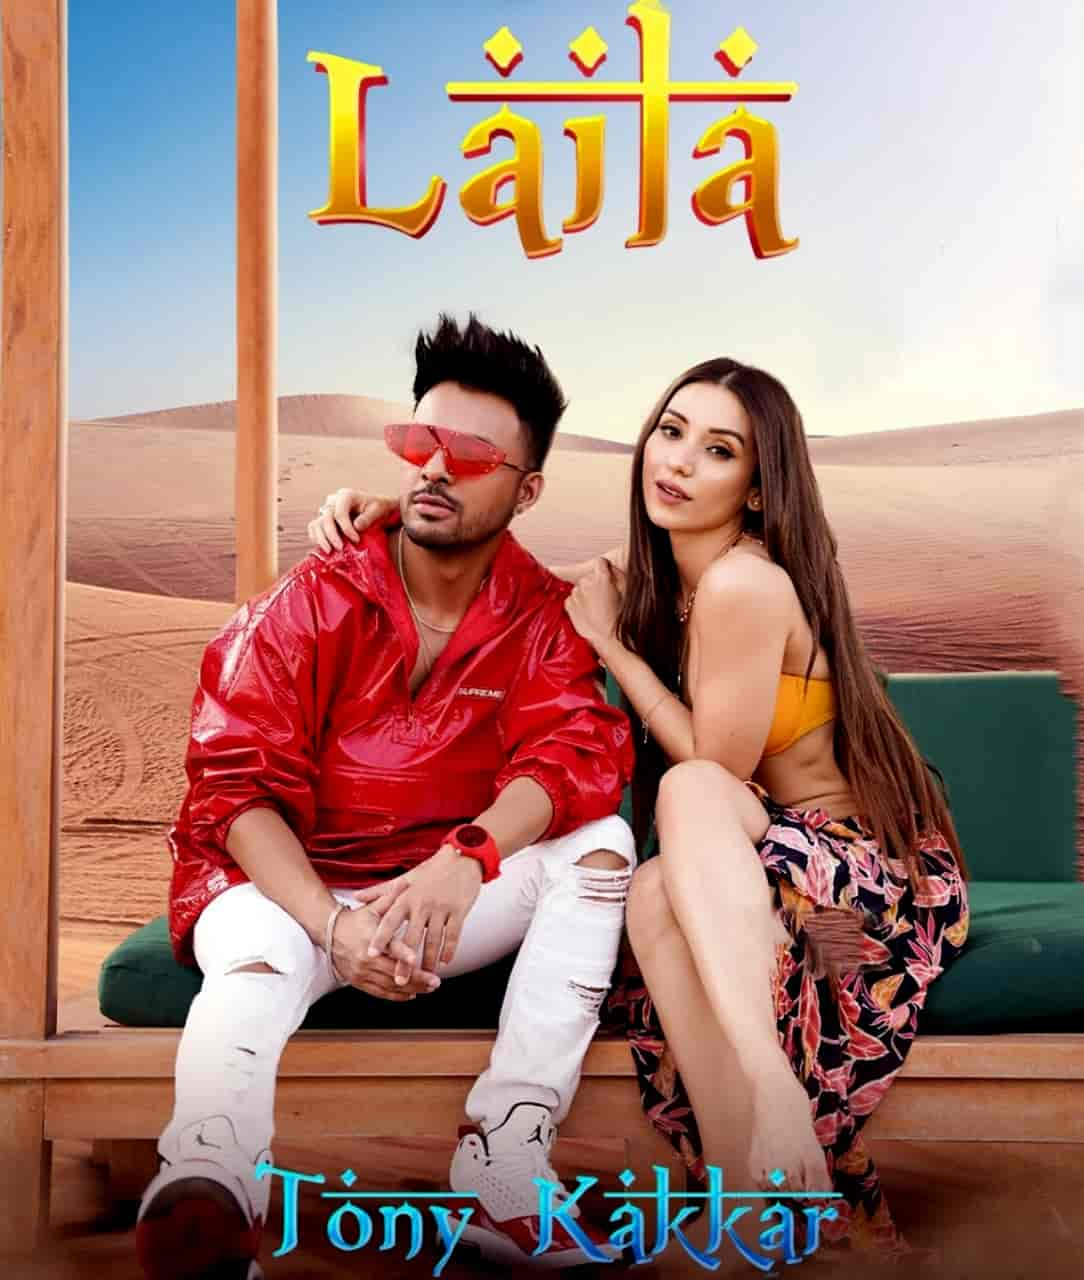 Laila Hindi Dance Song Image Features Tony Kakkar